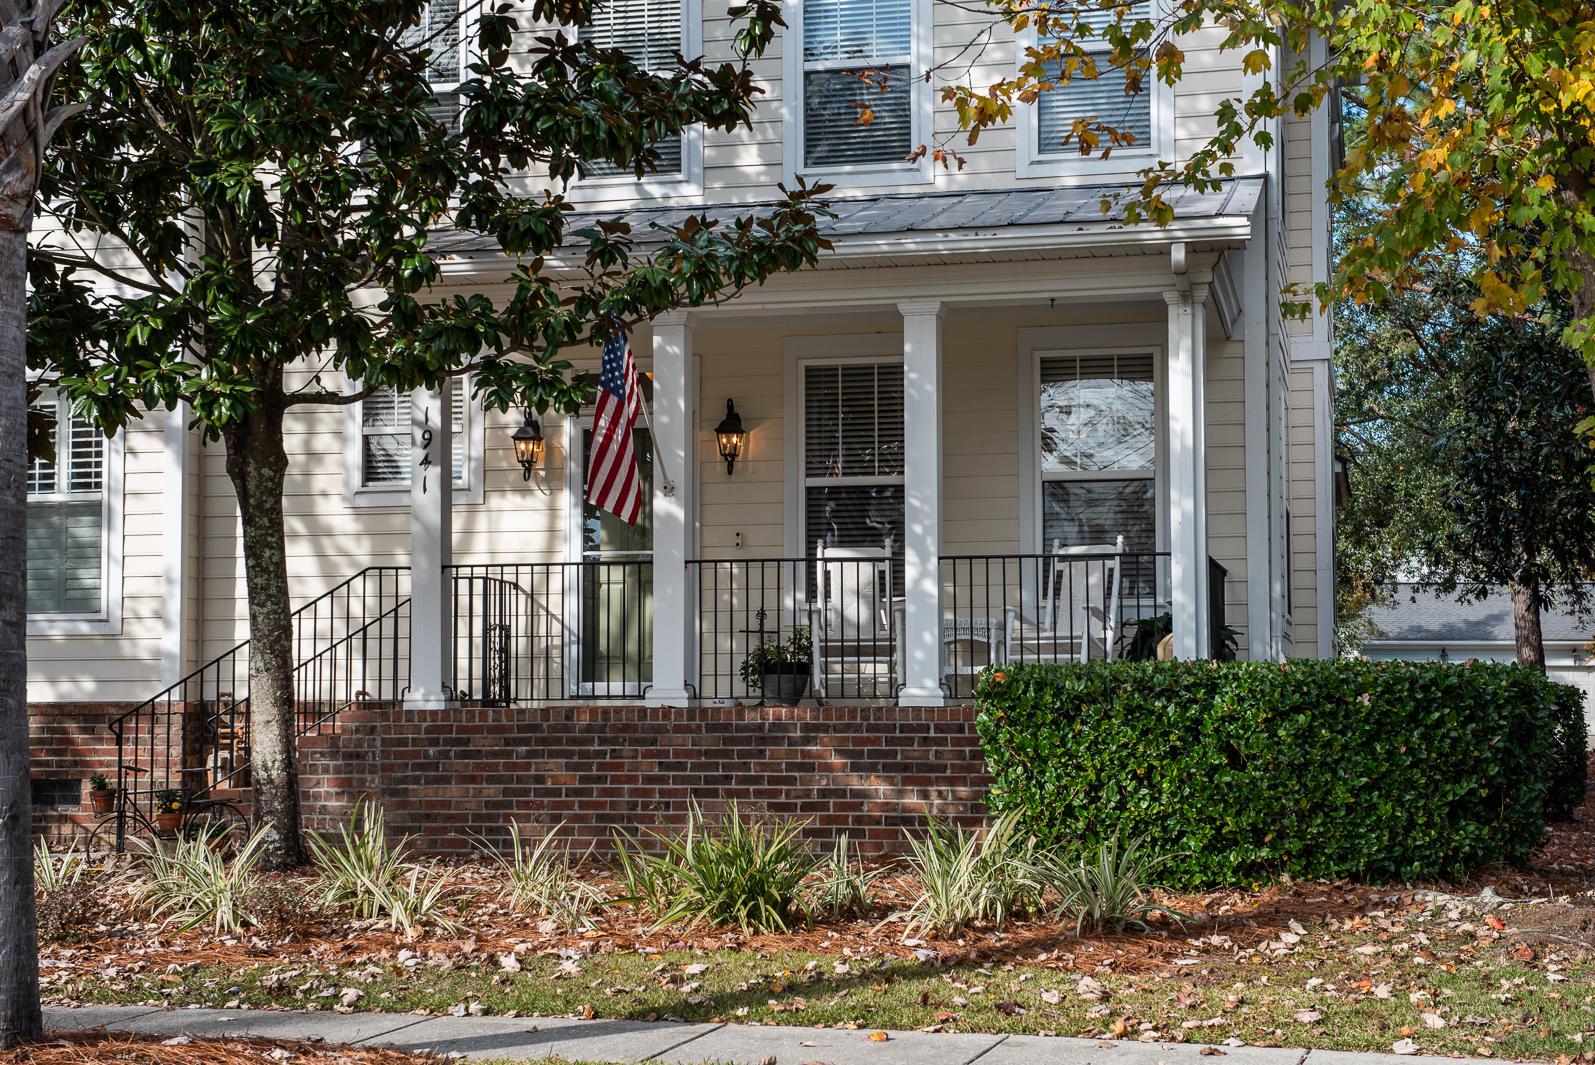 Barfield Park Homes For Sale - 1941 Pierce, Charleston, SC - 1